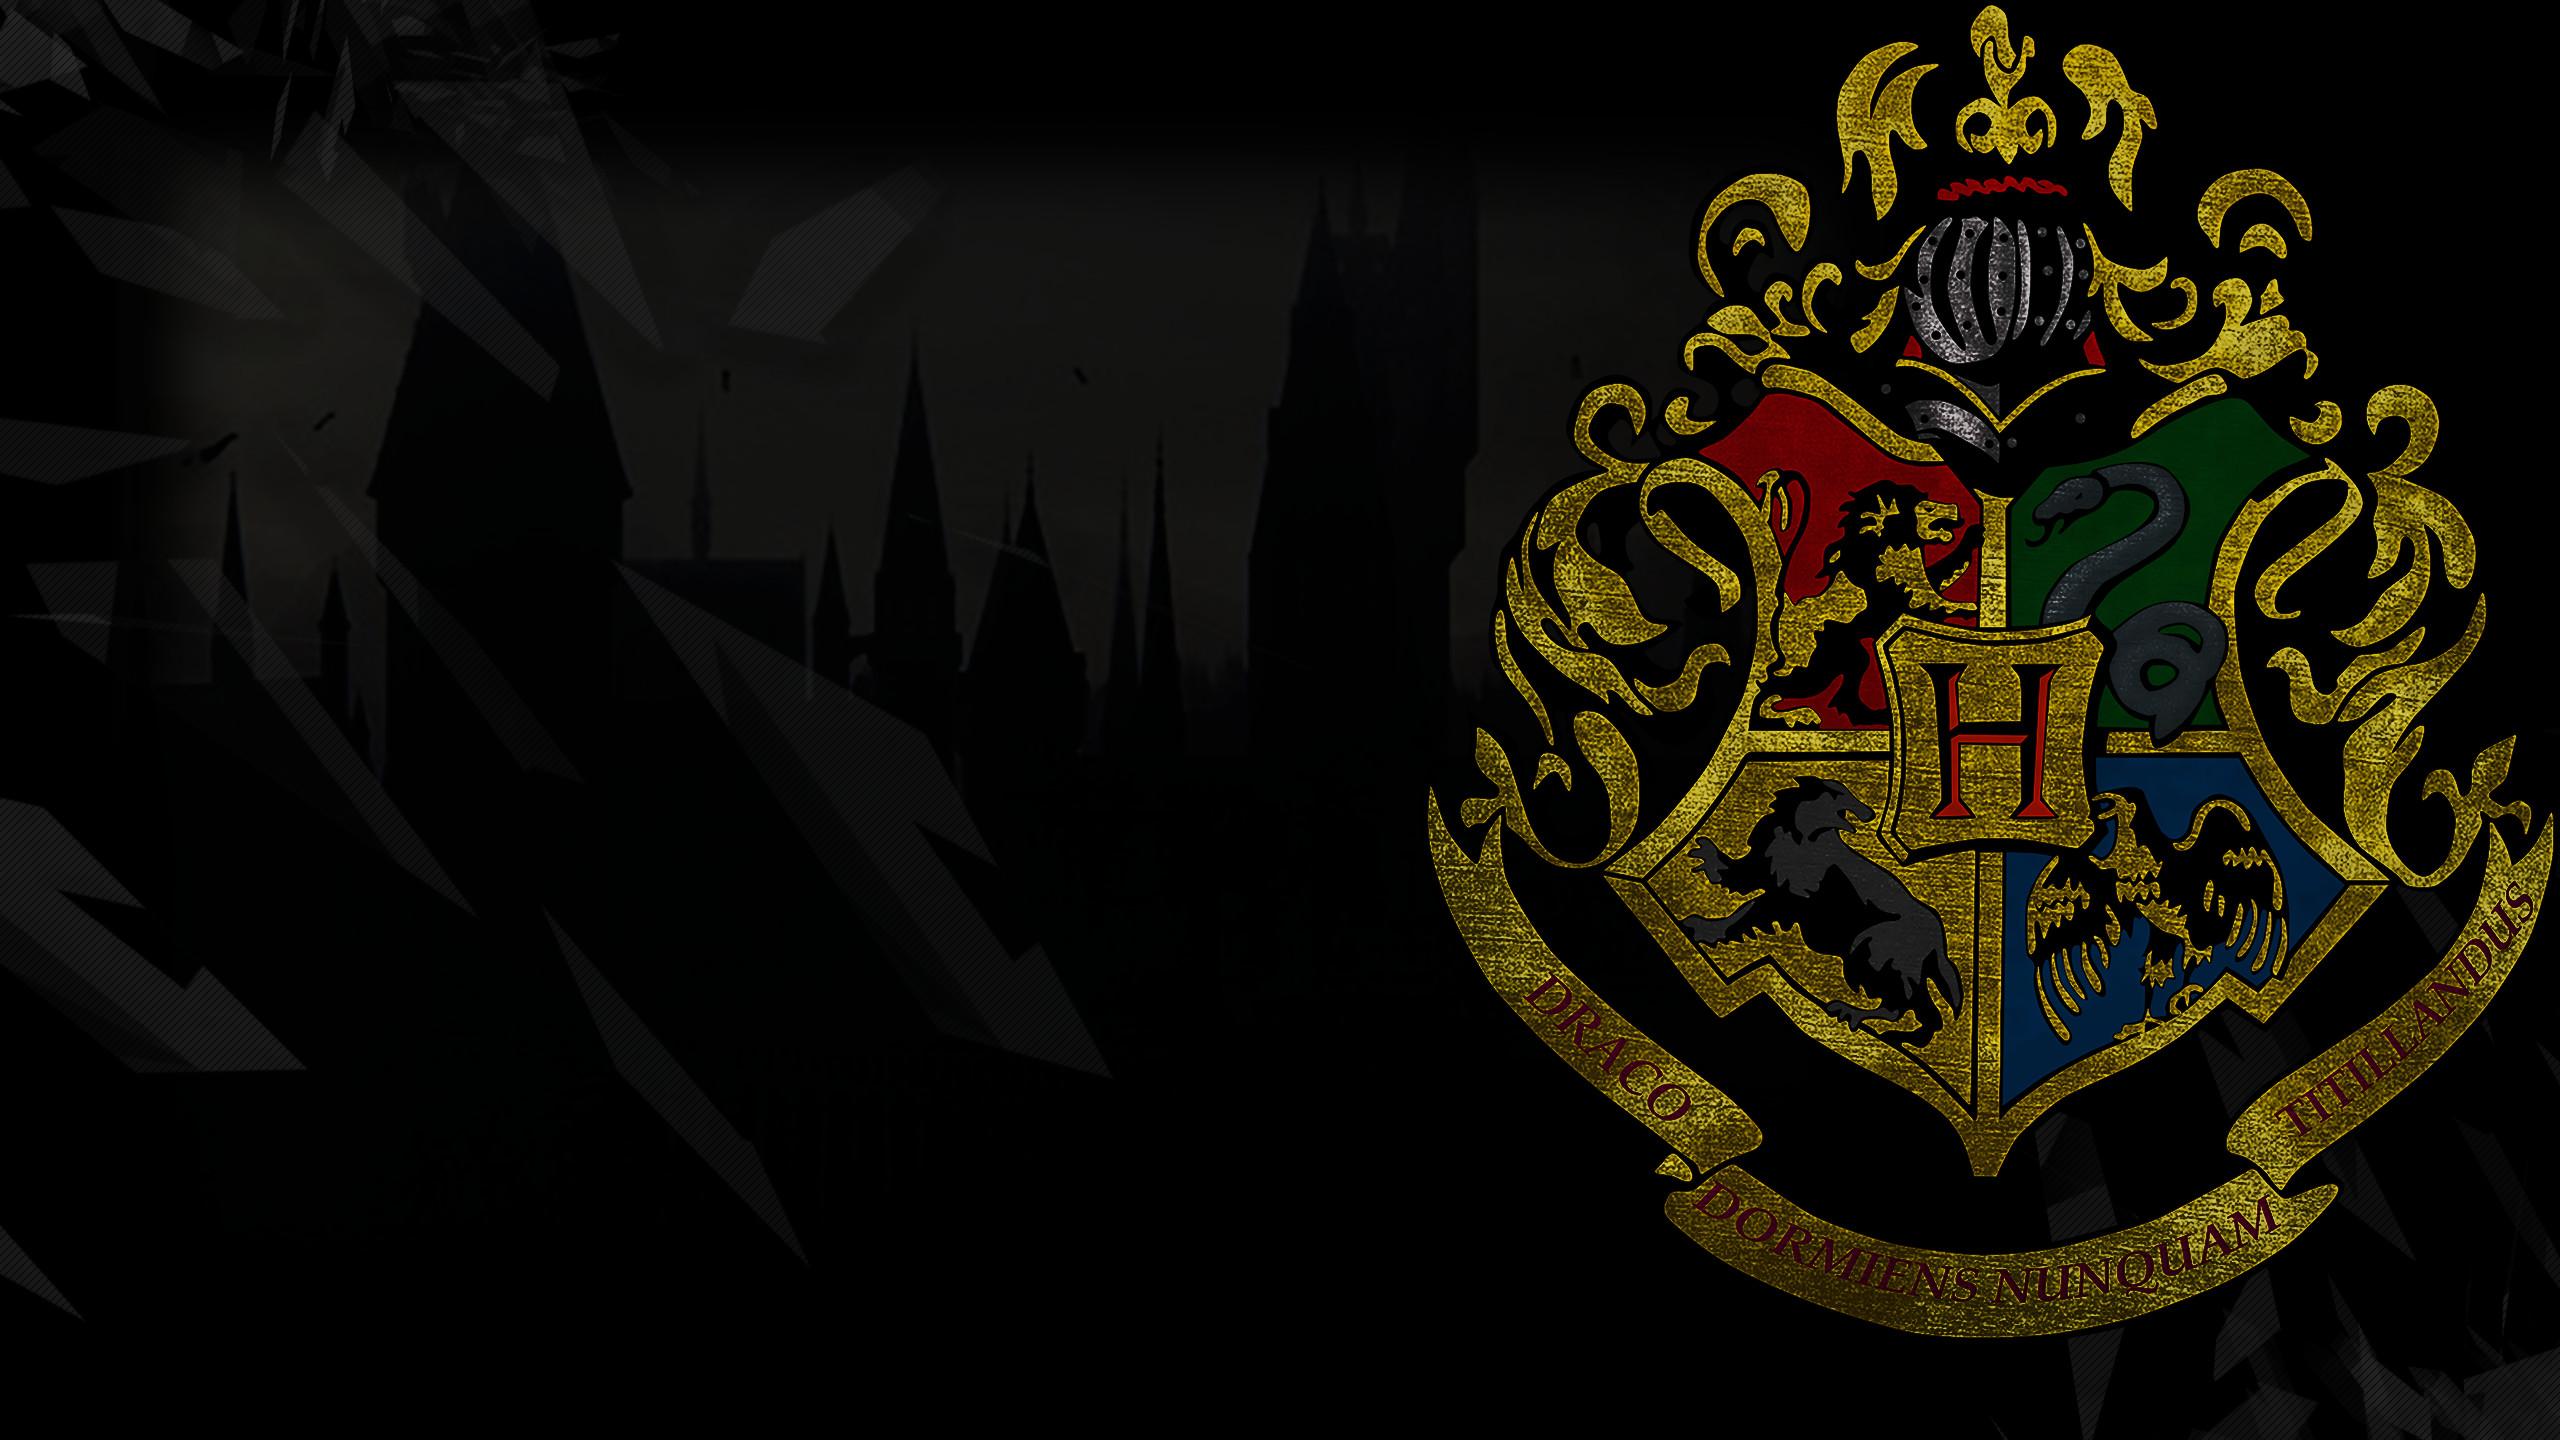 Movie – Harry Potter Gryffindor Slytherin Hufflepuff Ravenclaw Wallpaper